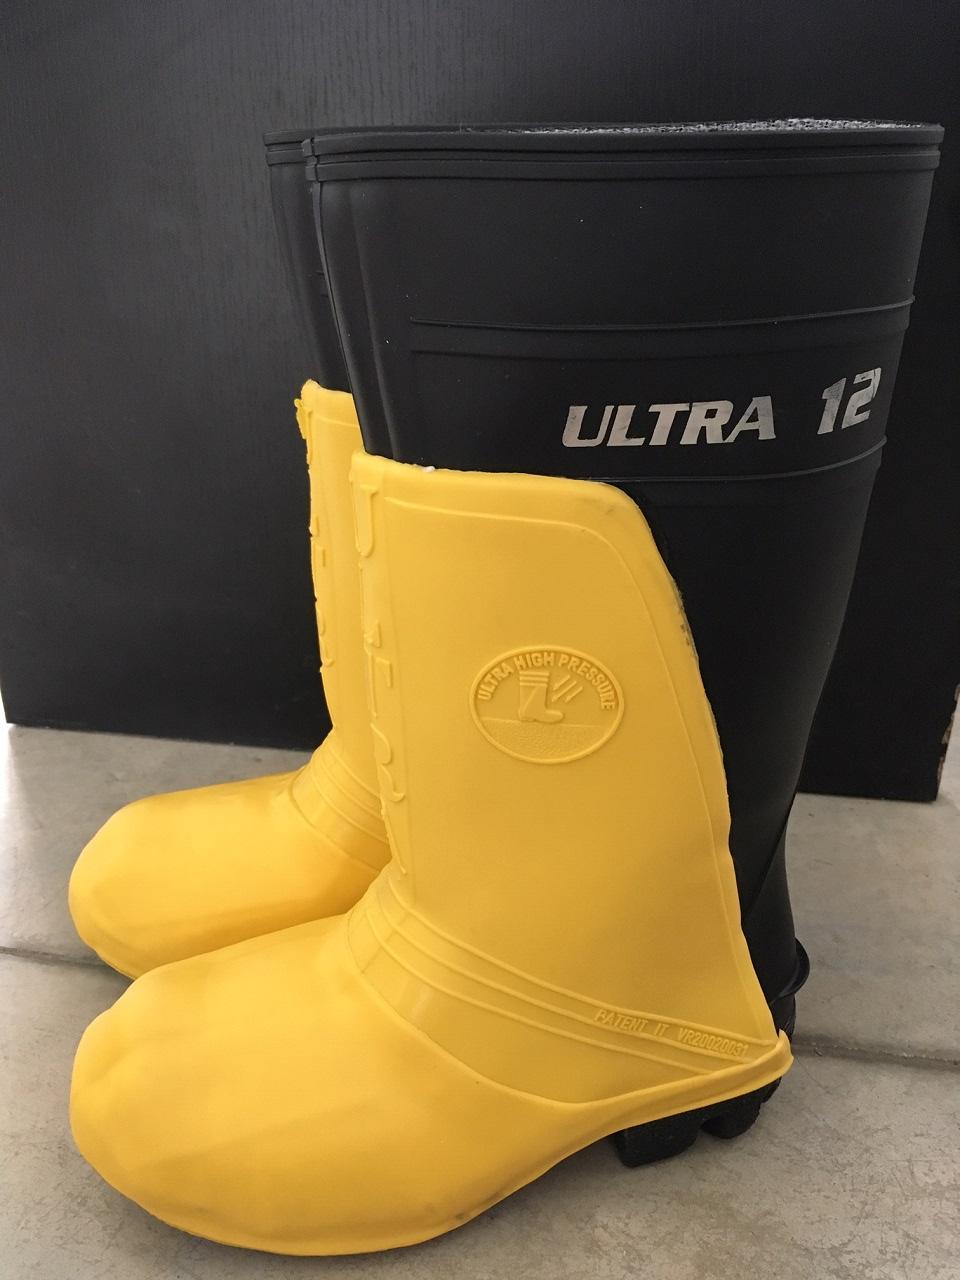 Bottes de protection ULTRA 1200